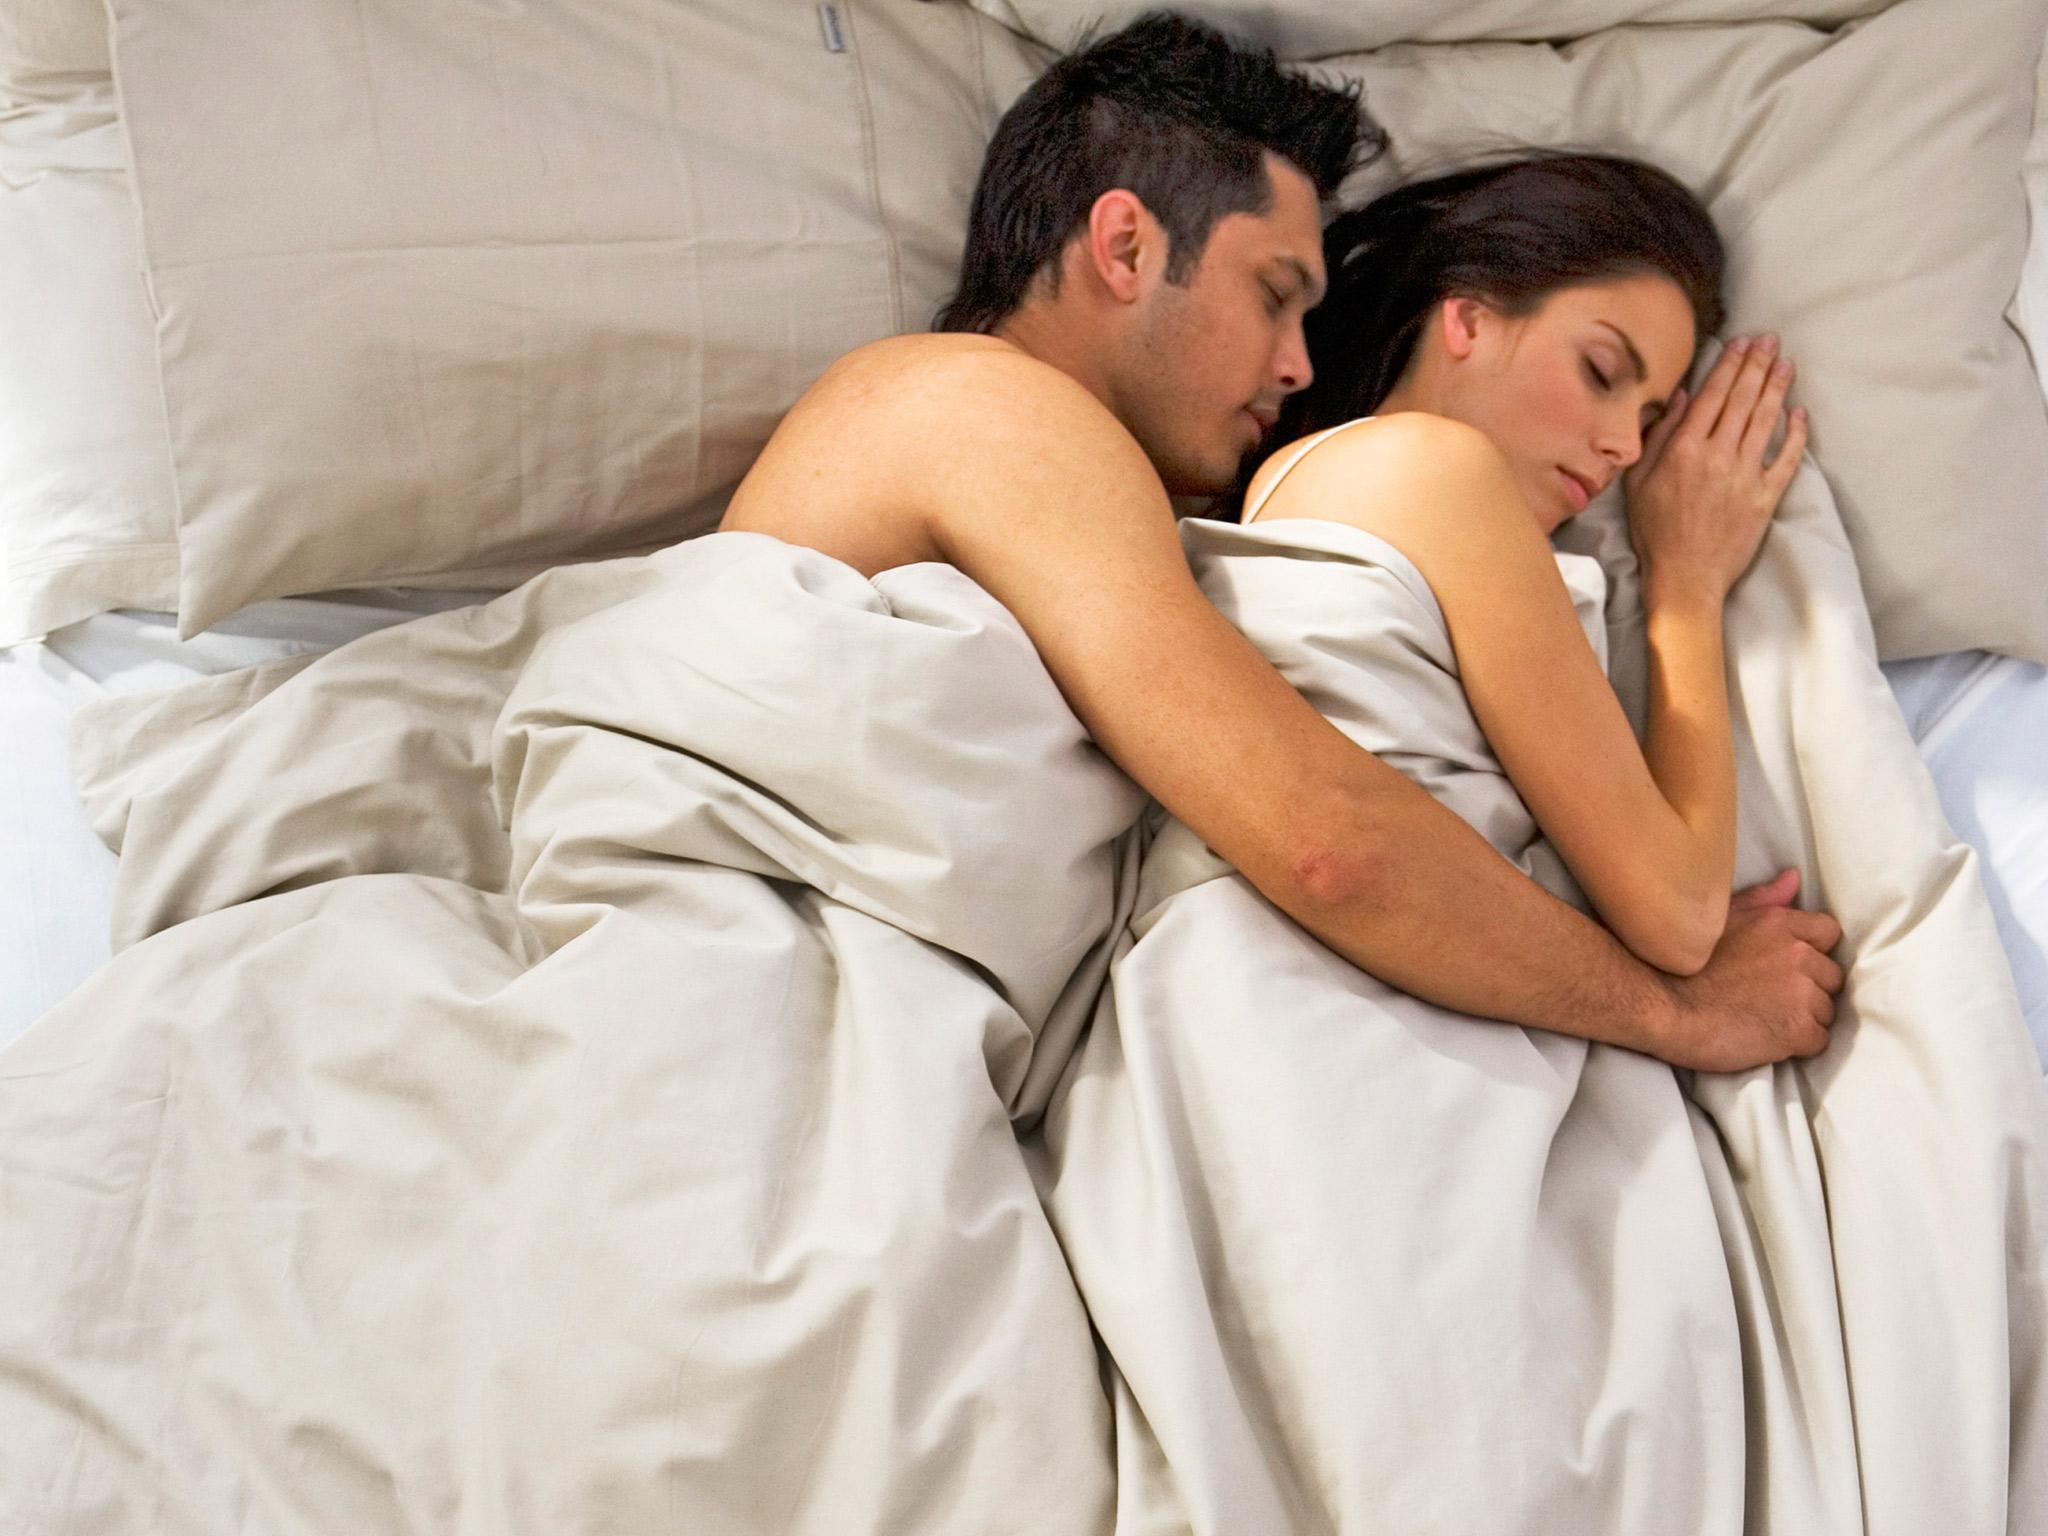 Фото парень и девушка в постели